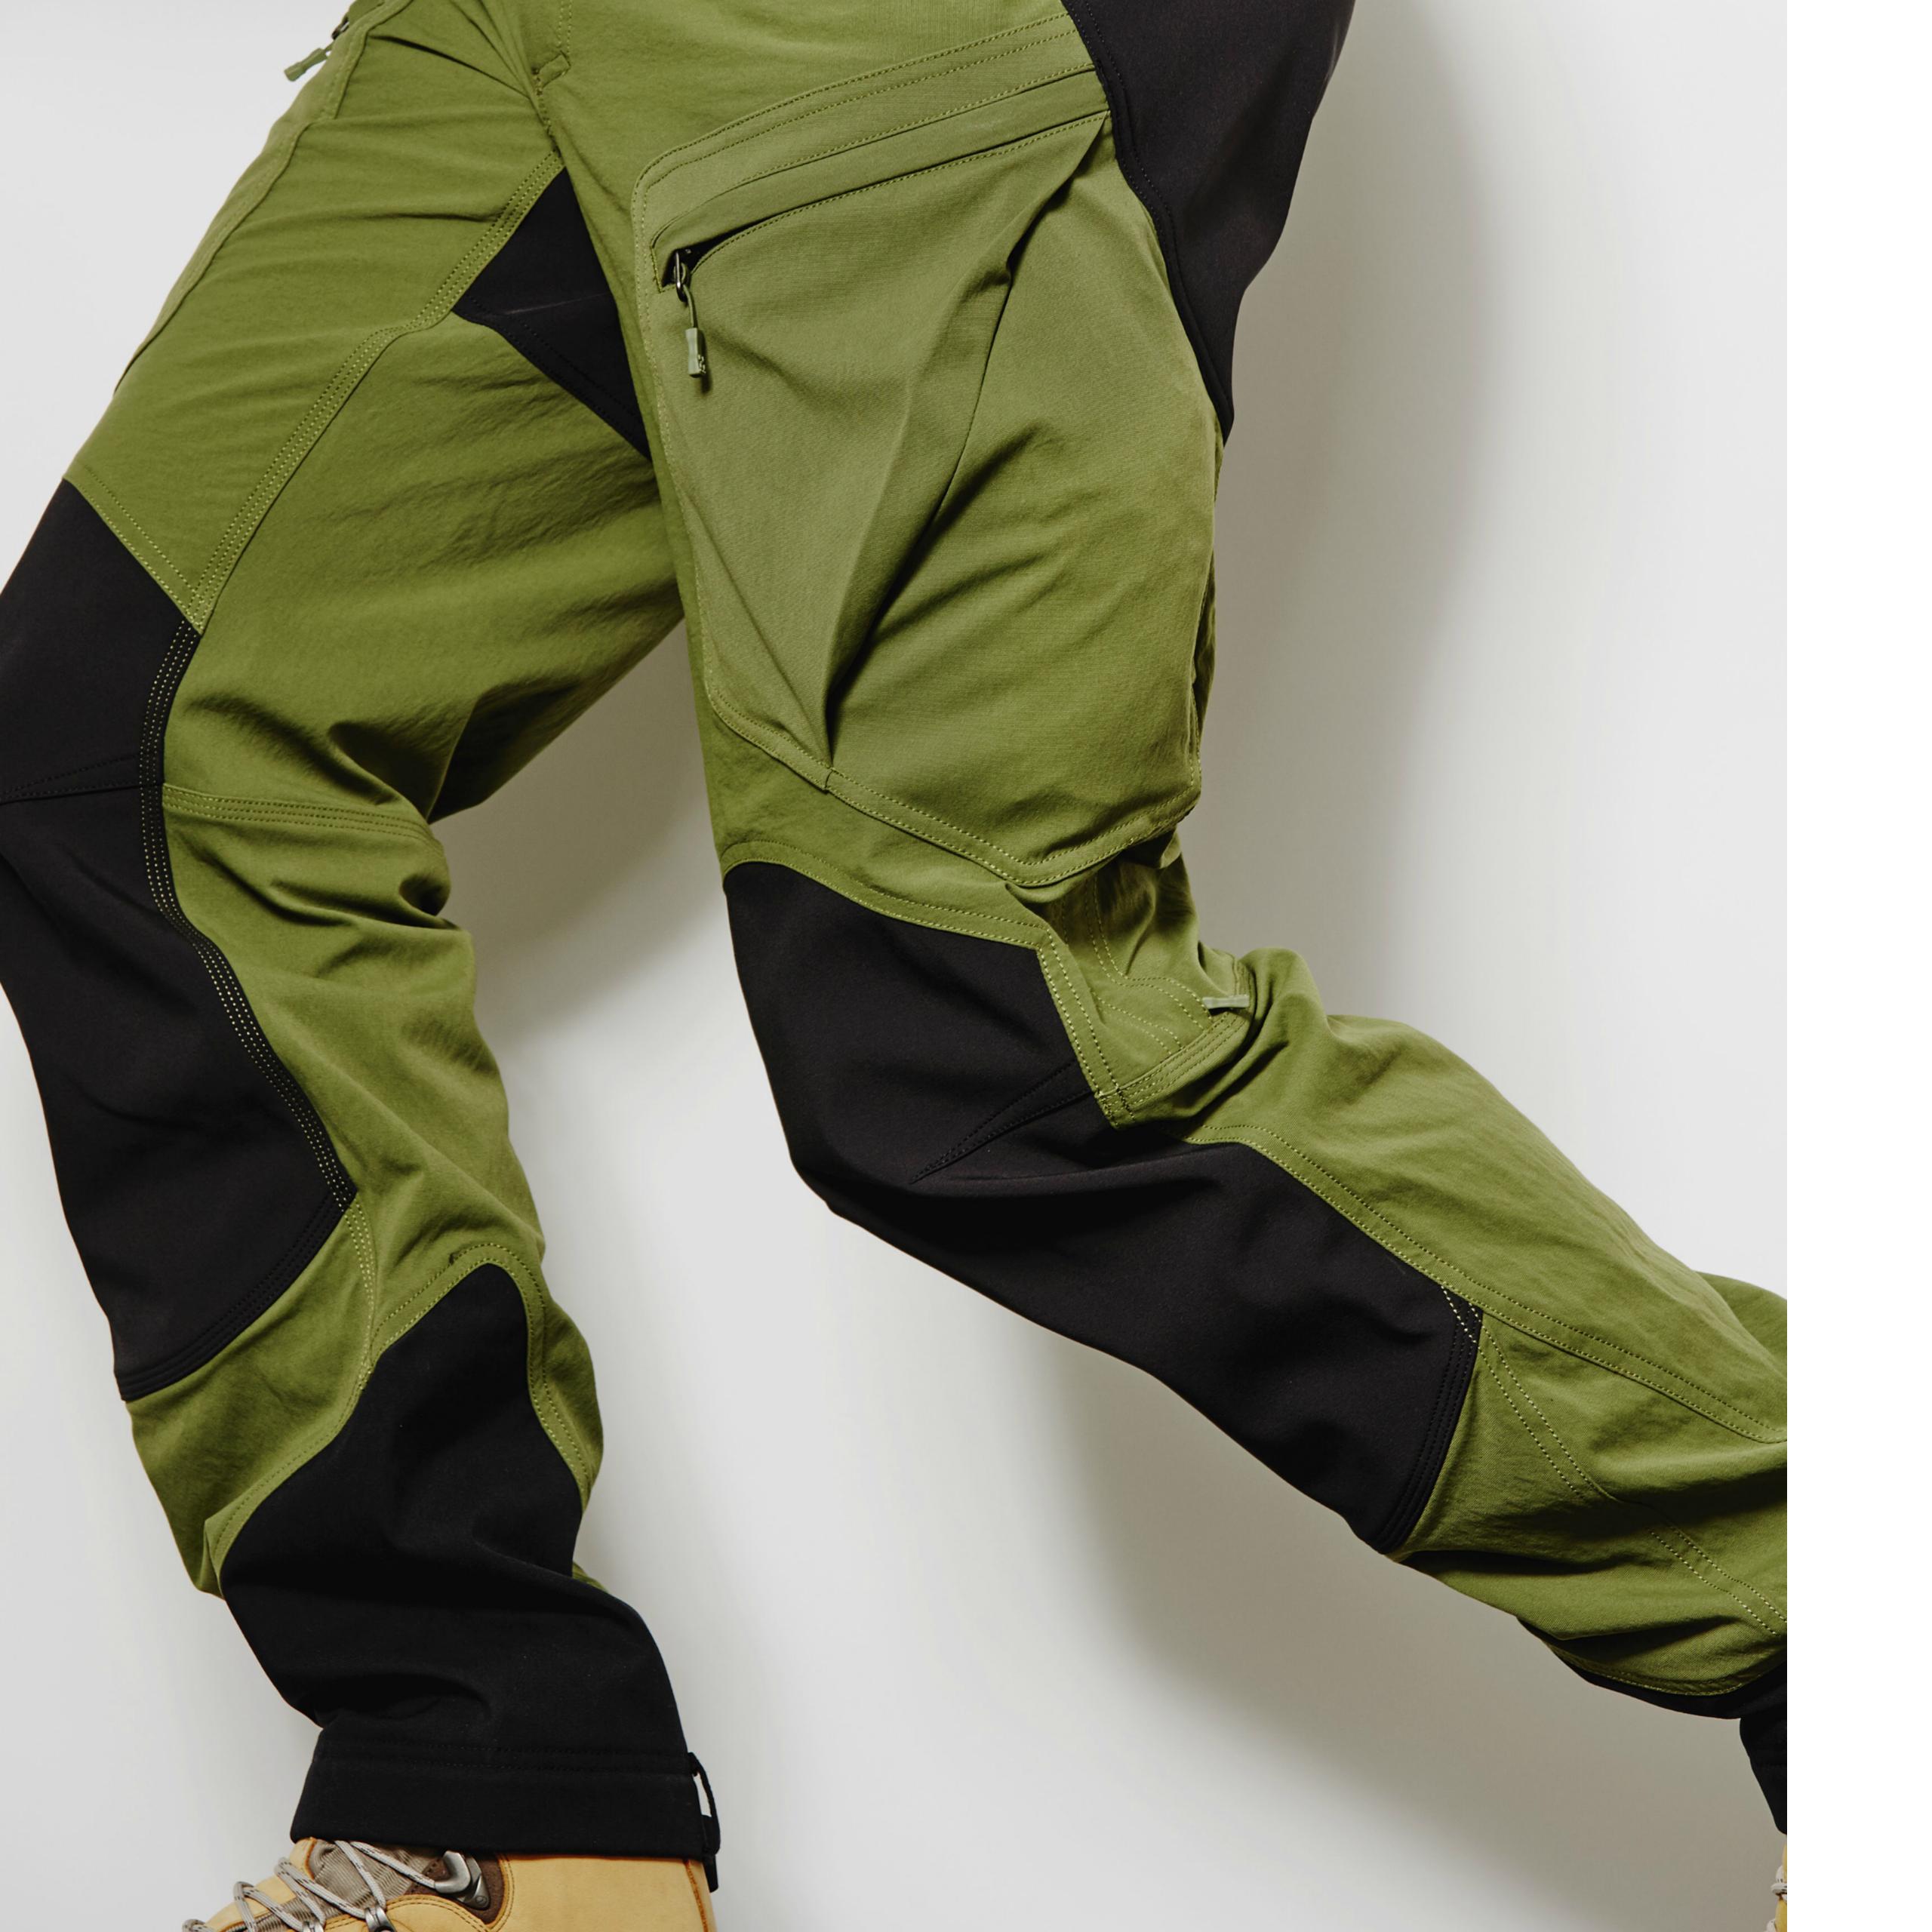 Rugged Ii Mountain Pant Men Haglofs Mens Work Pants Mens Fashion Rugged Mens Outdoor Pants